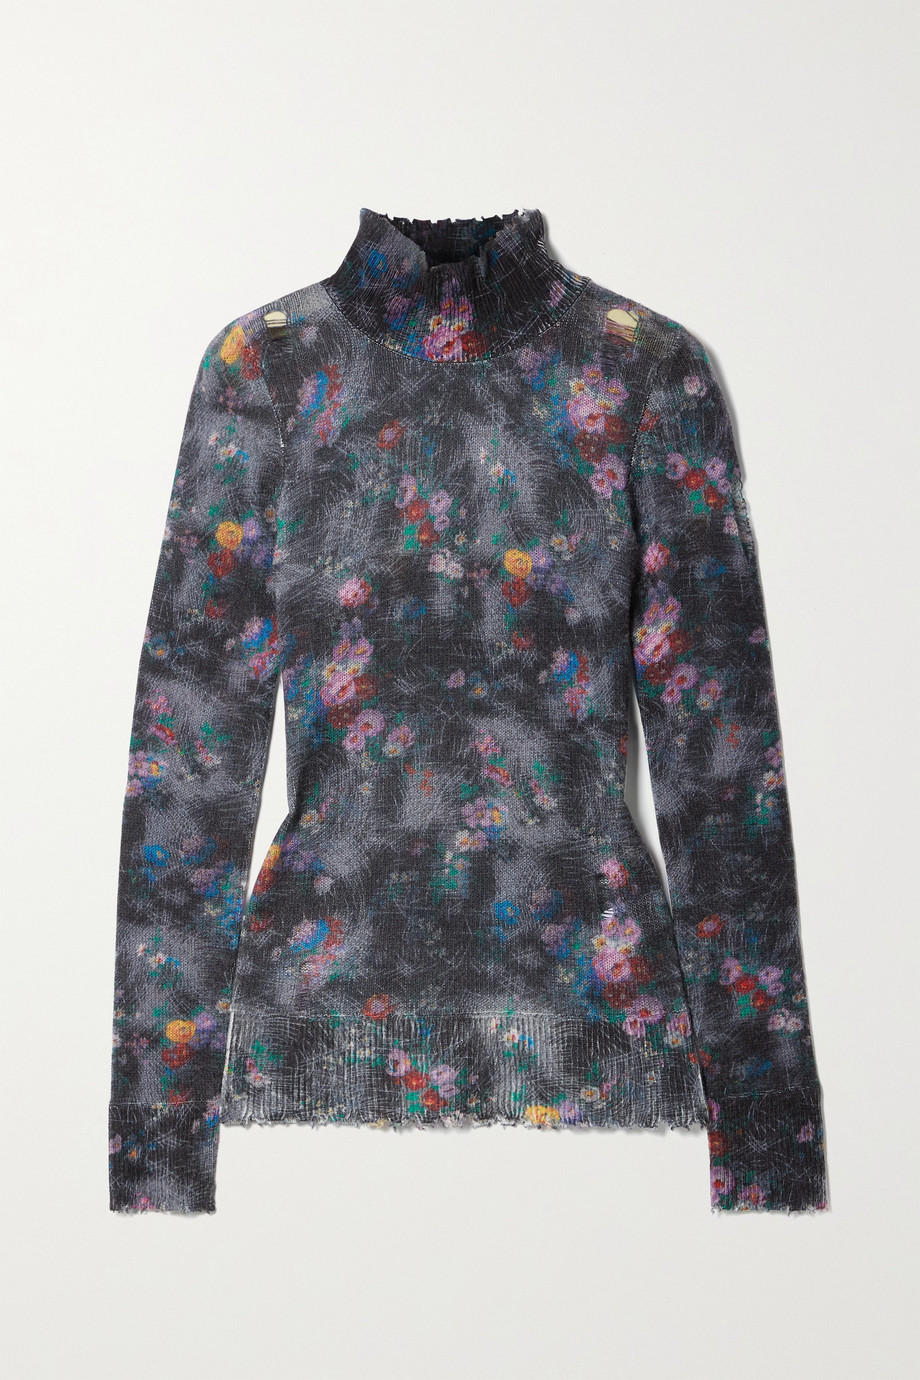 R13 Distressed floral-print cashmere turtleneck sweater